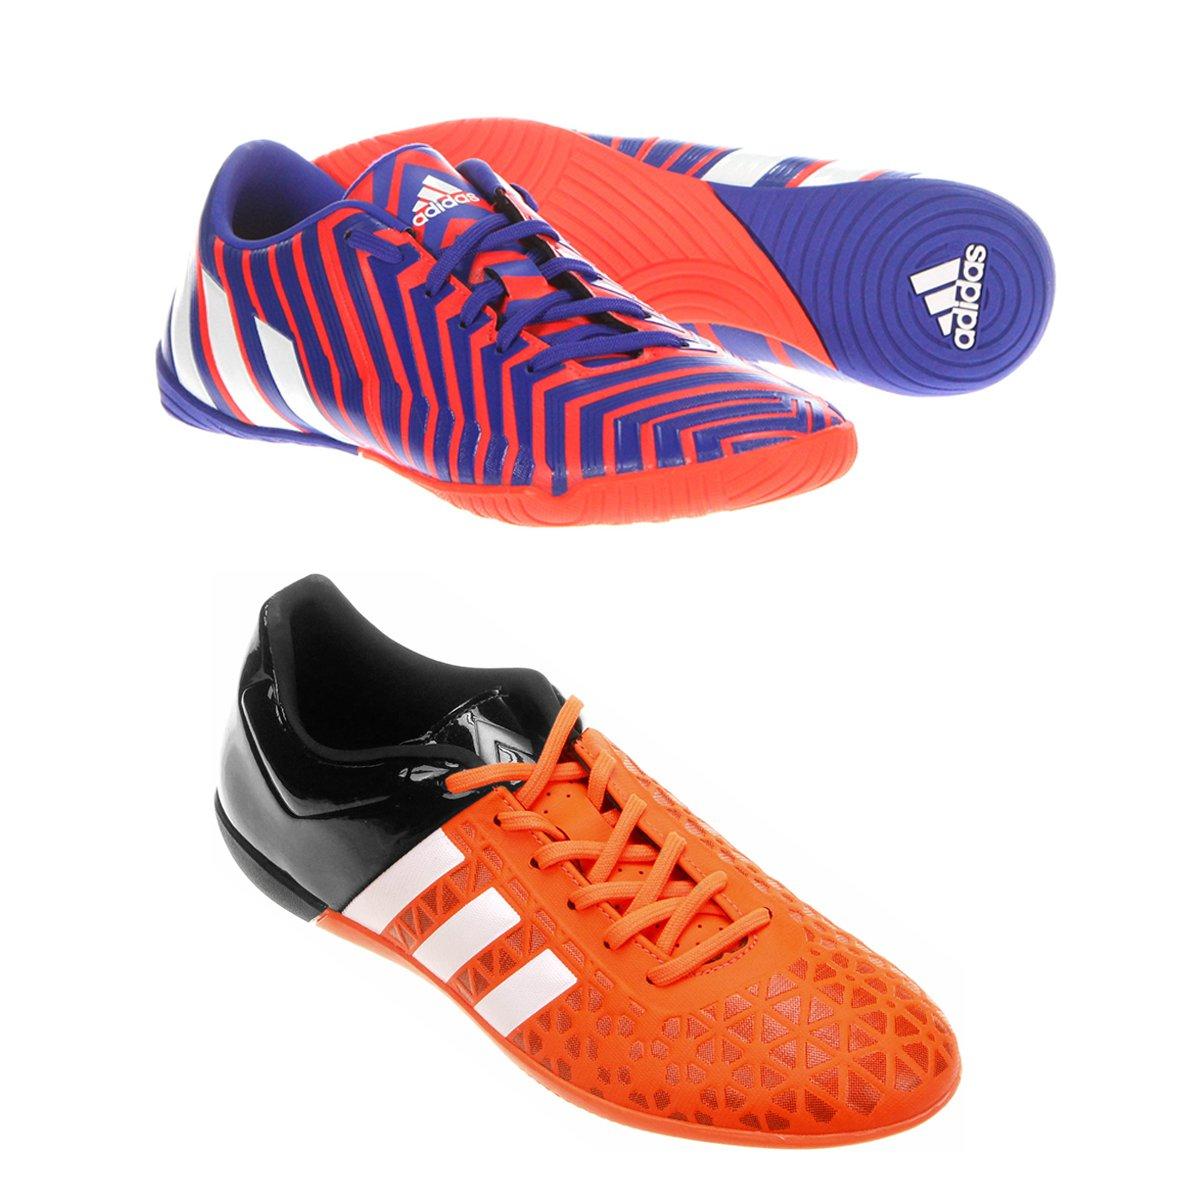 kit Chuteira Adidas Ace 15 3 IN Futsal + Chuteira Adidas Absolado Instinct  IN Futsal - Compre Agora  a31190ea67217